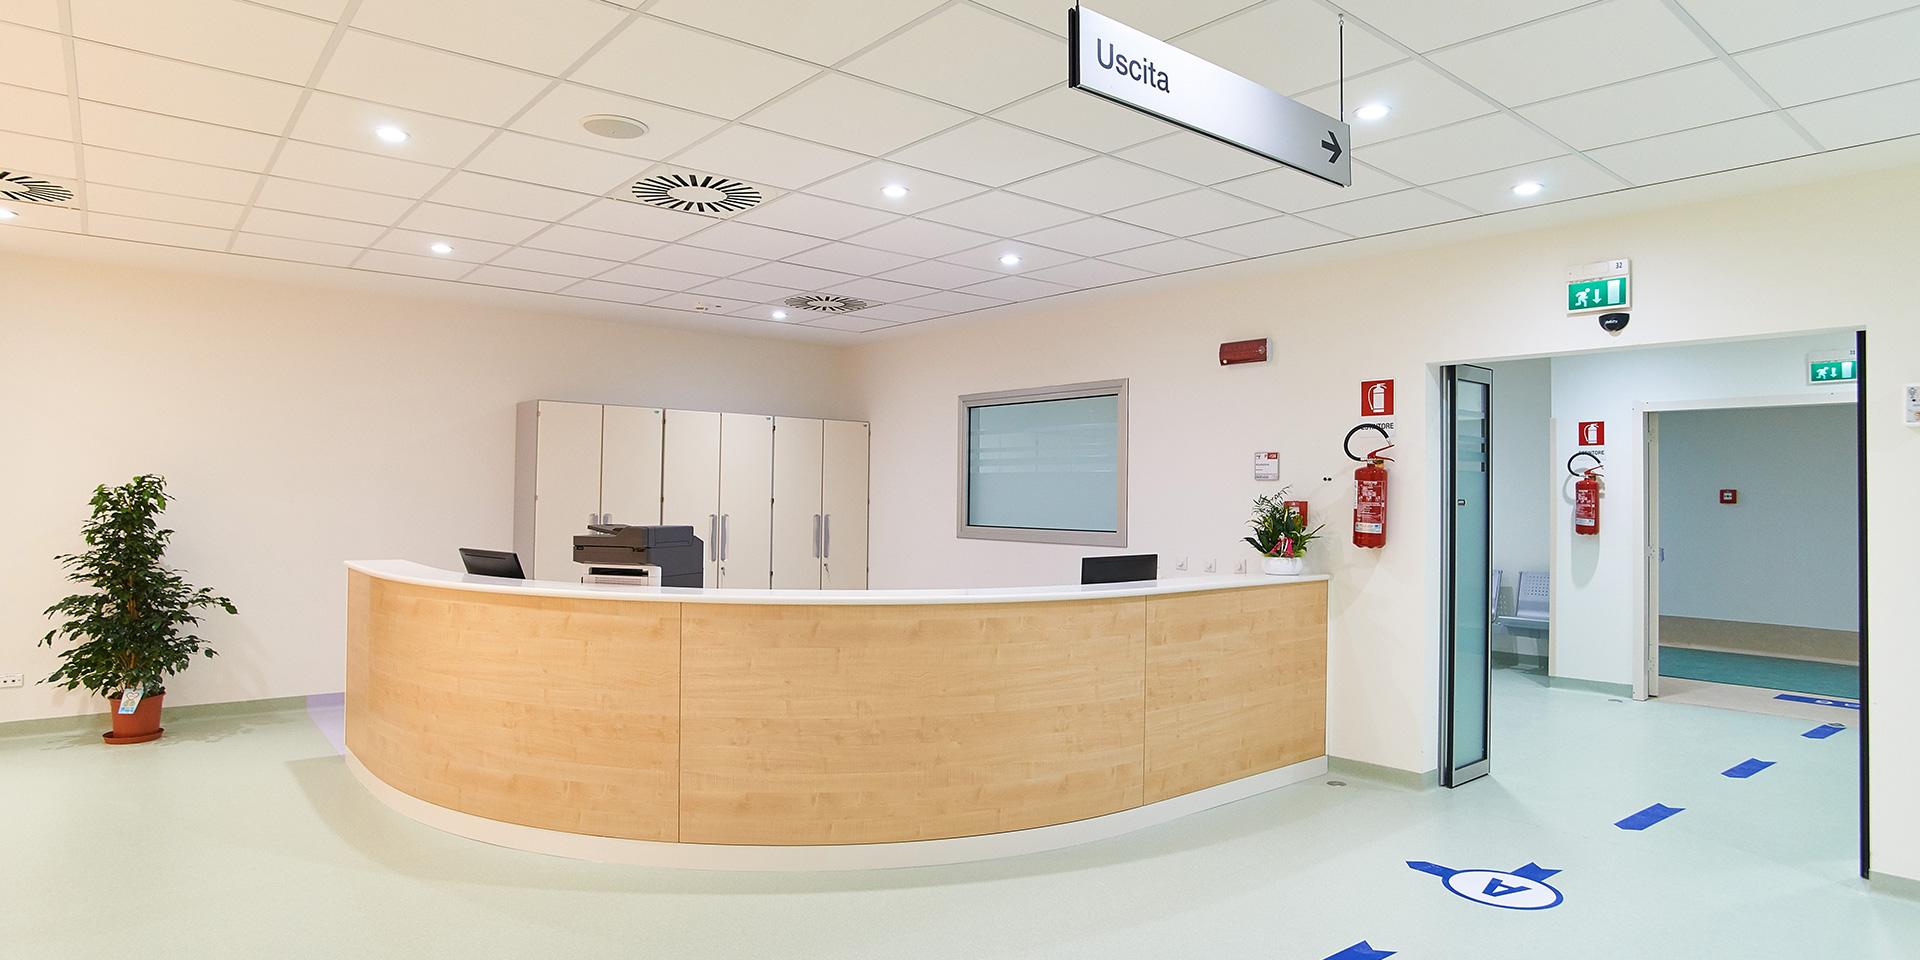 DEAS a Careggi, Firenze, Binini Partners, Società di architettura e ingegneria